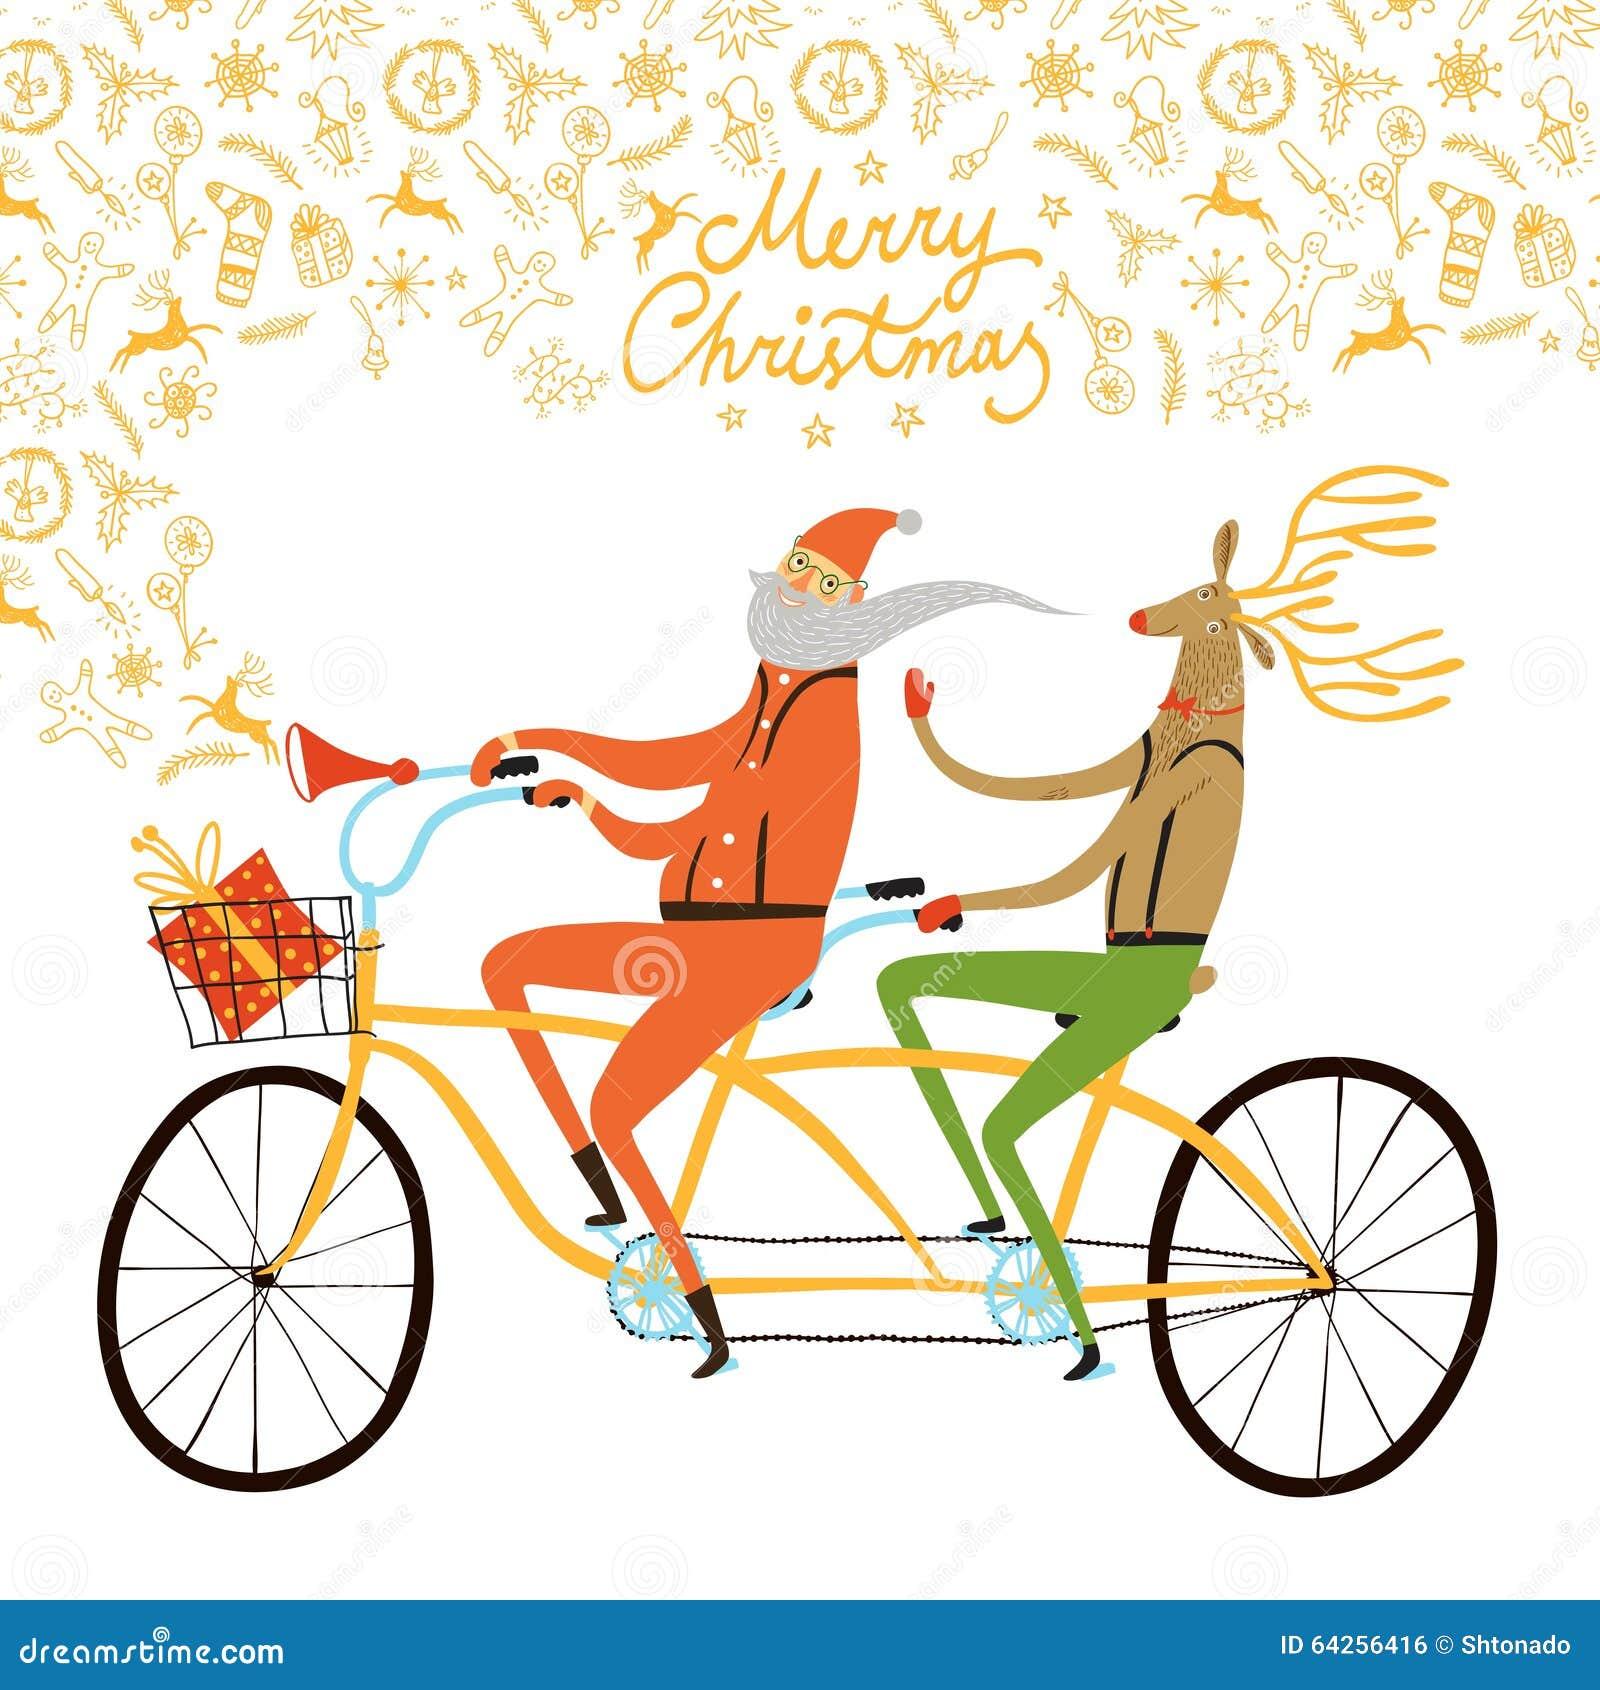 Santa Claus And Reindeer Cyclists Christmas Illustration ...